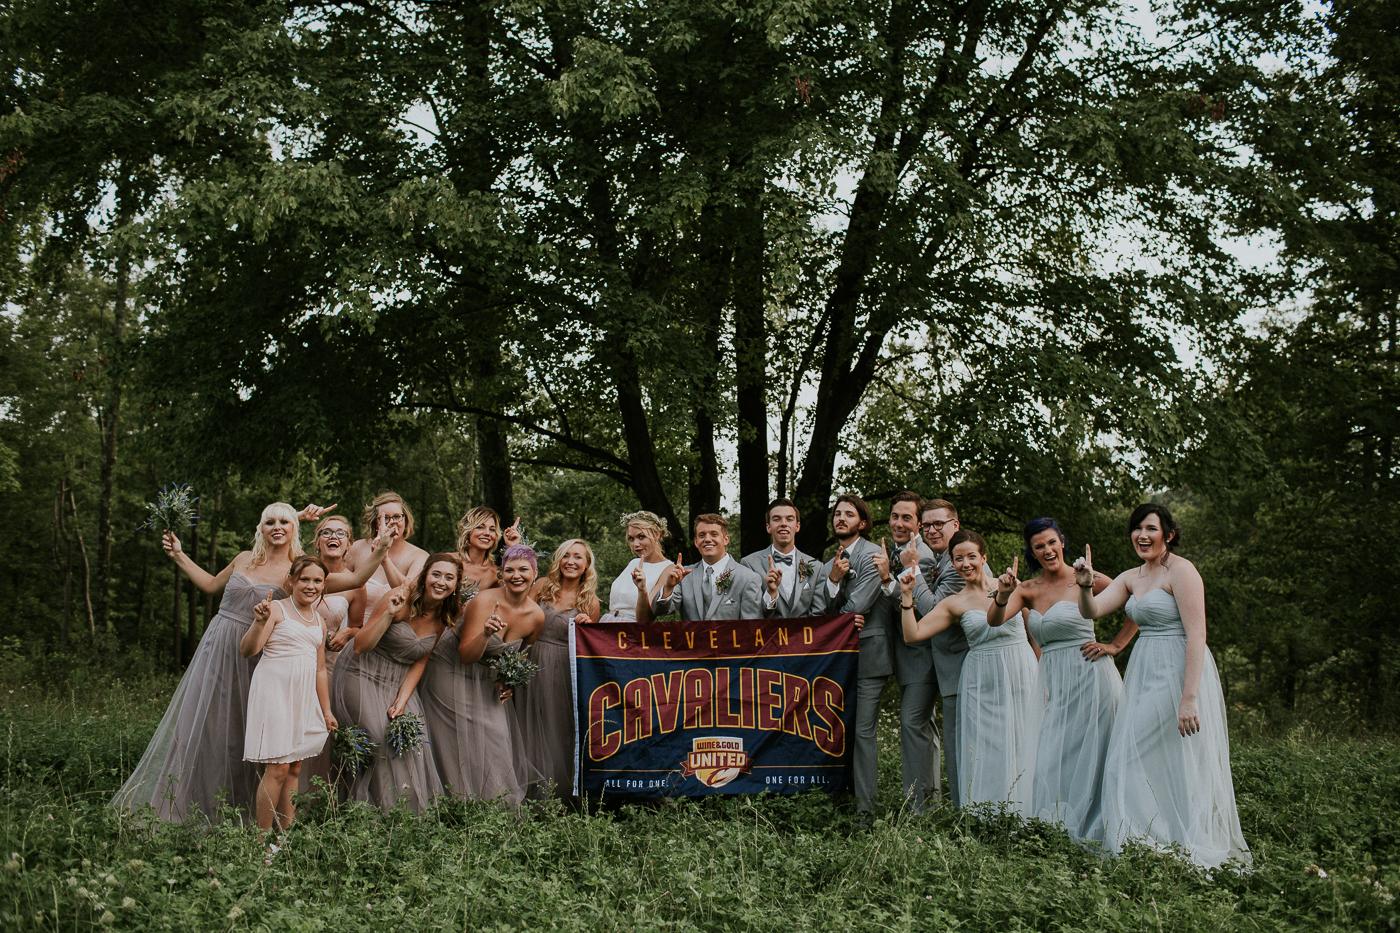 ohio wedding photographer Grace E. Jones Photography cleveland cavaliers